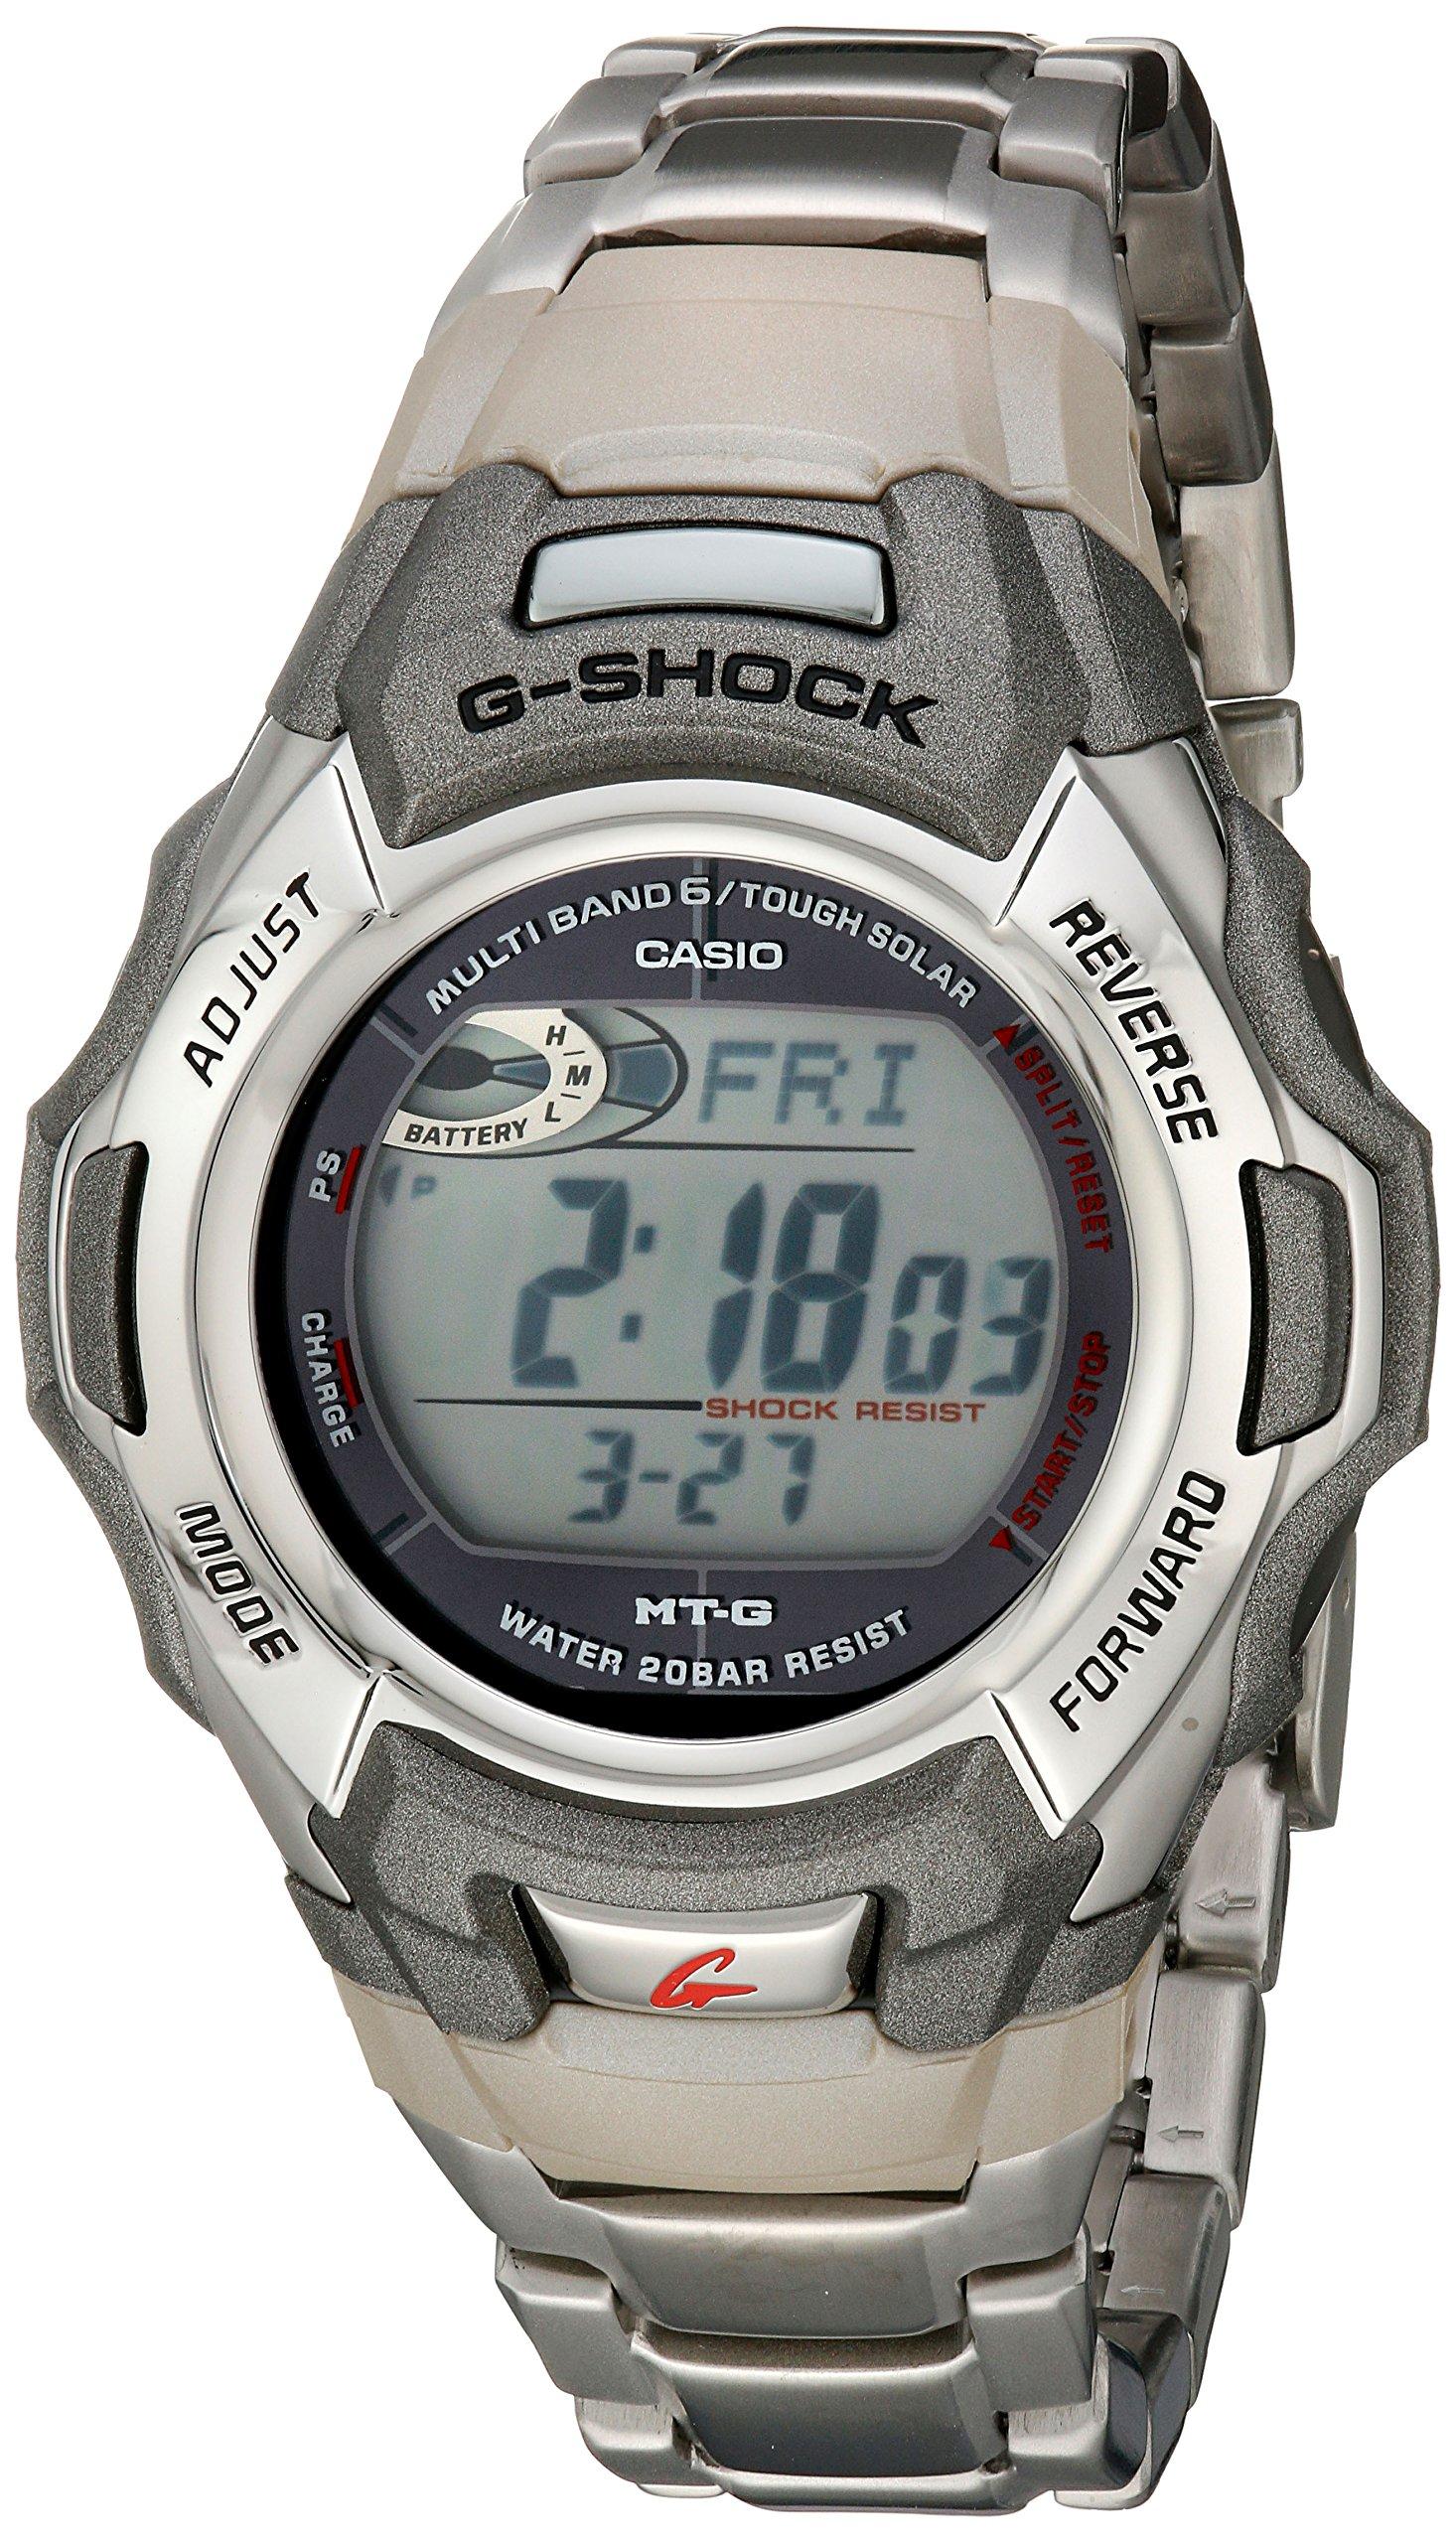 ویکالا · خرید  اصل اورجینال · خرید از آمازون · Casio Men's G-Shock MTGM900DA-8CR Tough Solar Atomic Stainless Steel Sport Watch wekala · ویکالا